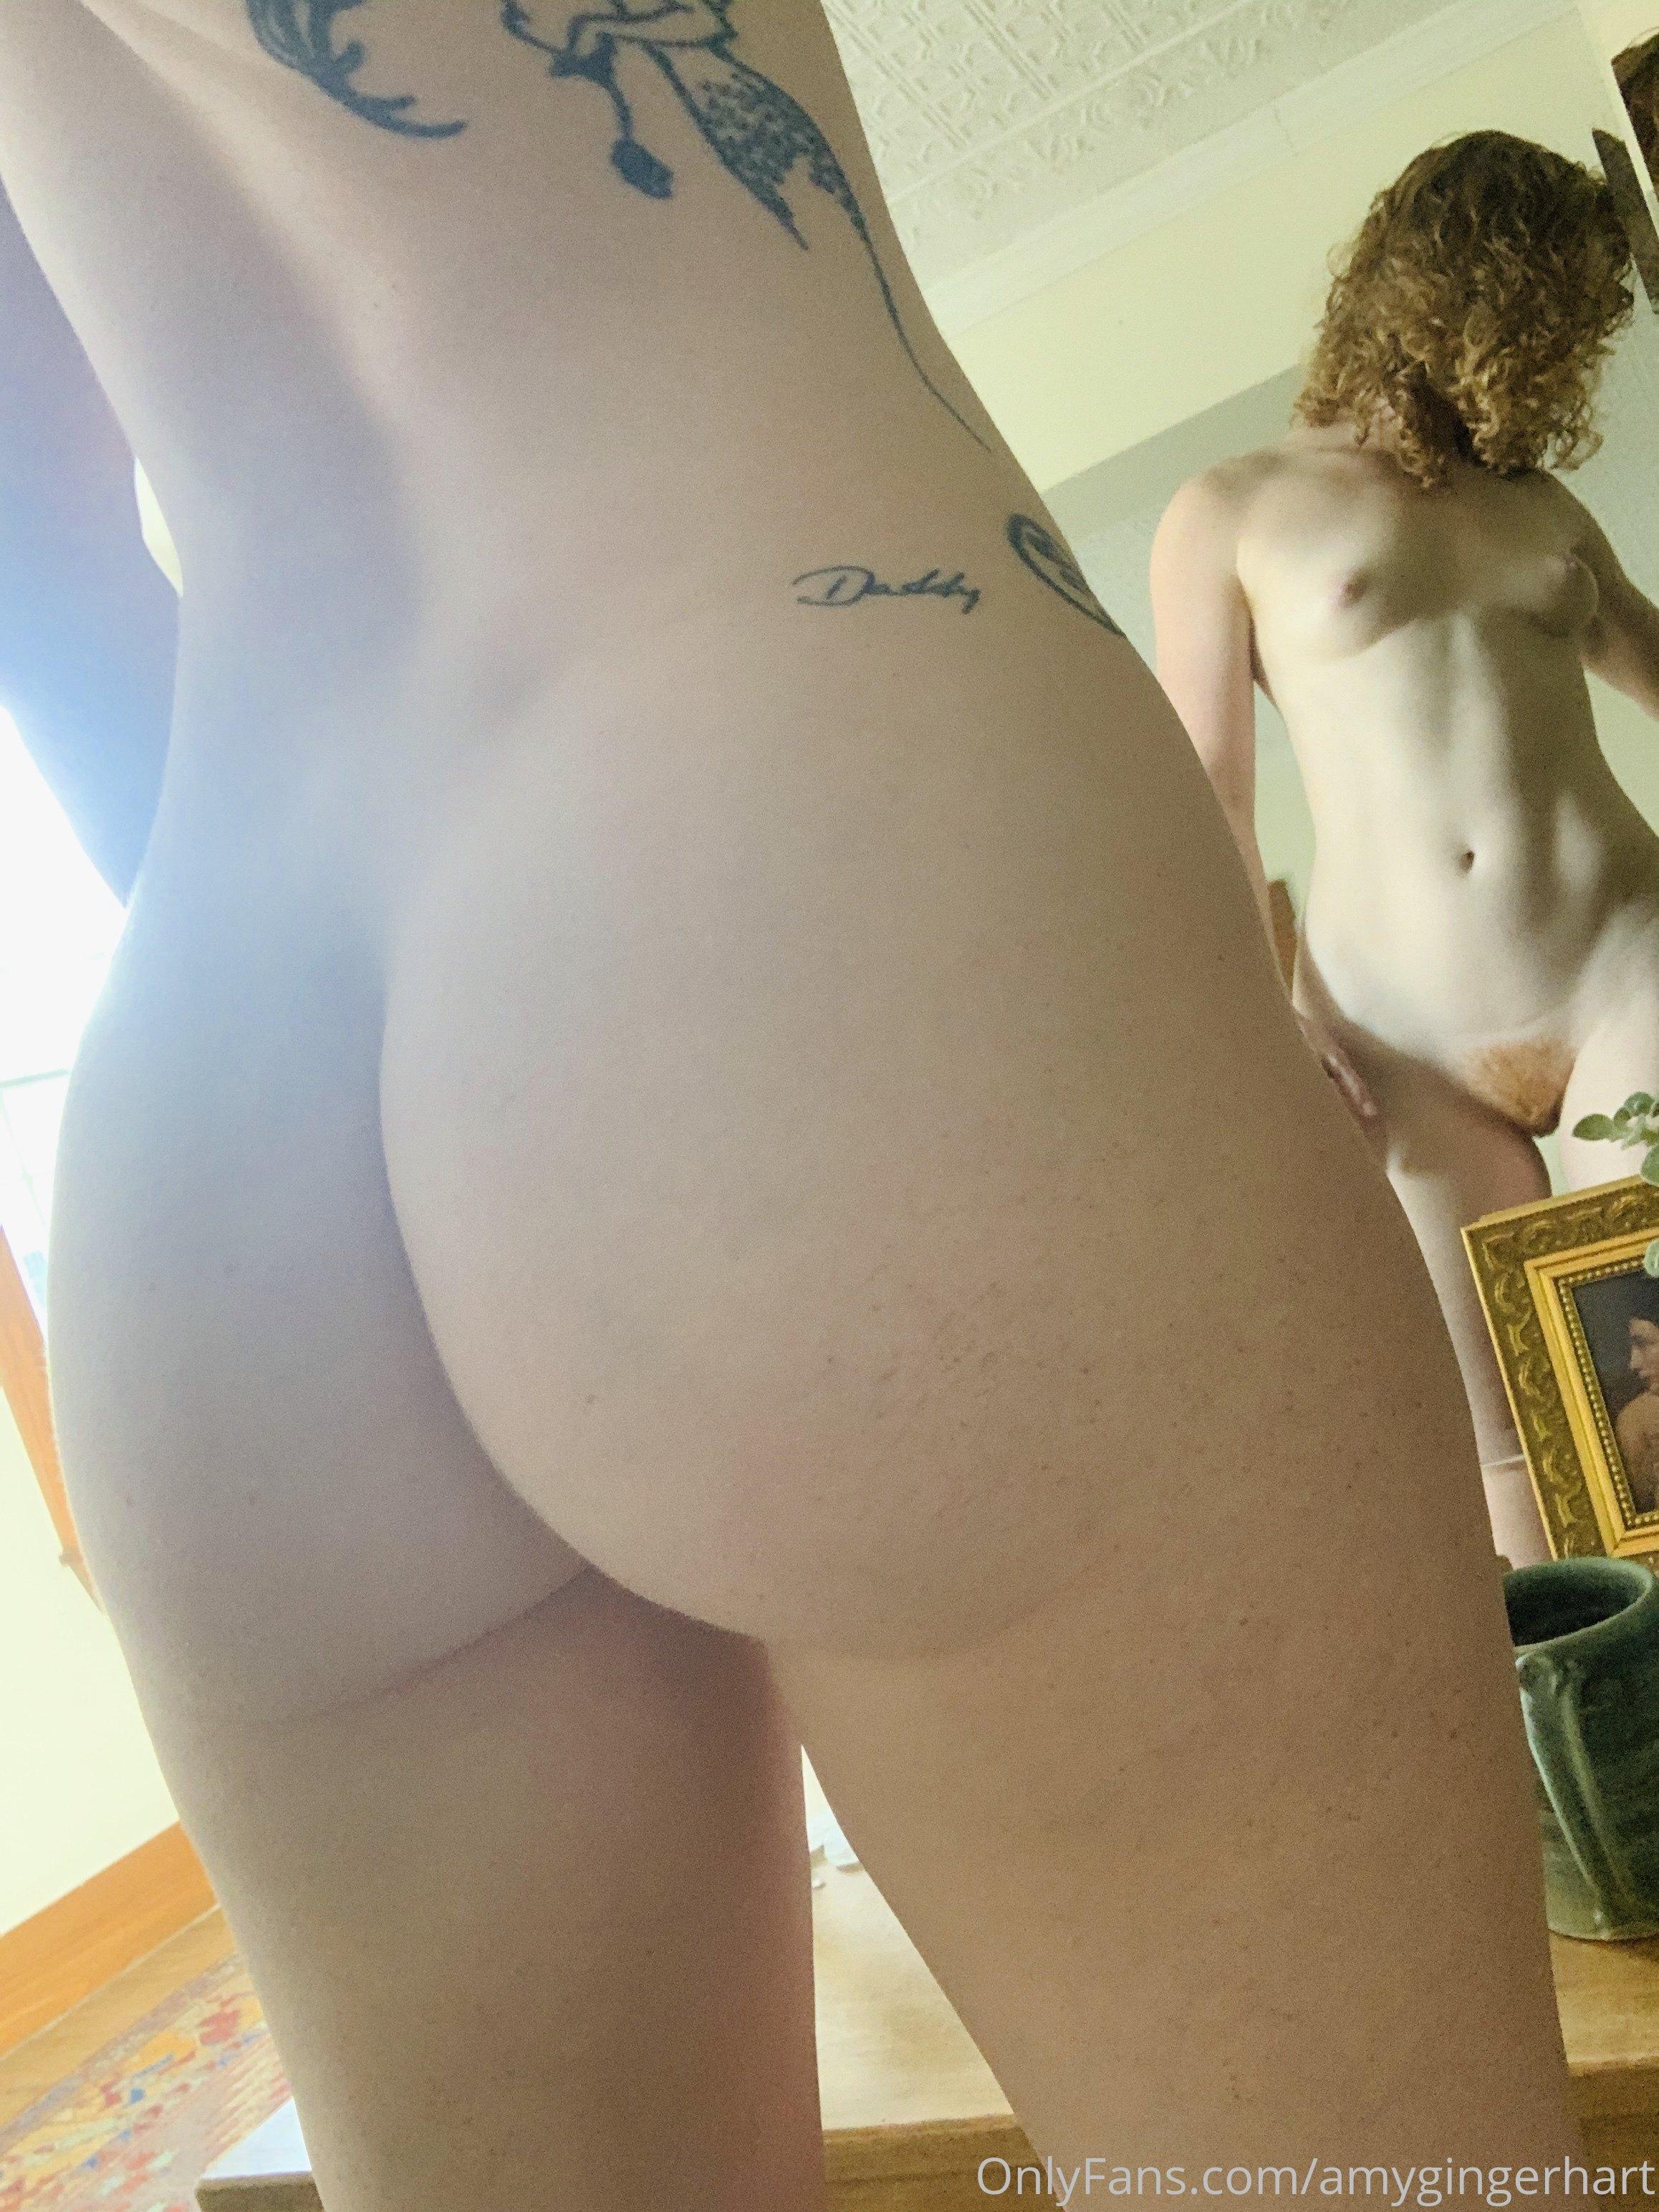 Amy Hart, Amygingerhart, Onlyfans 0144